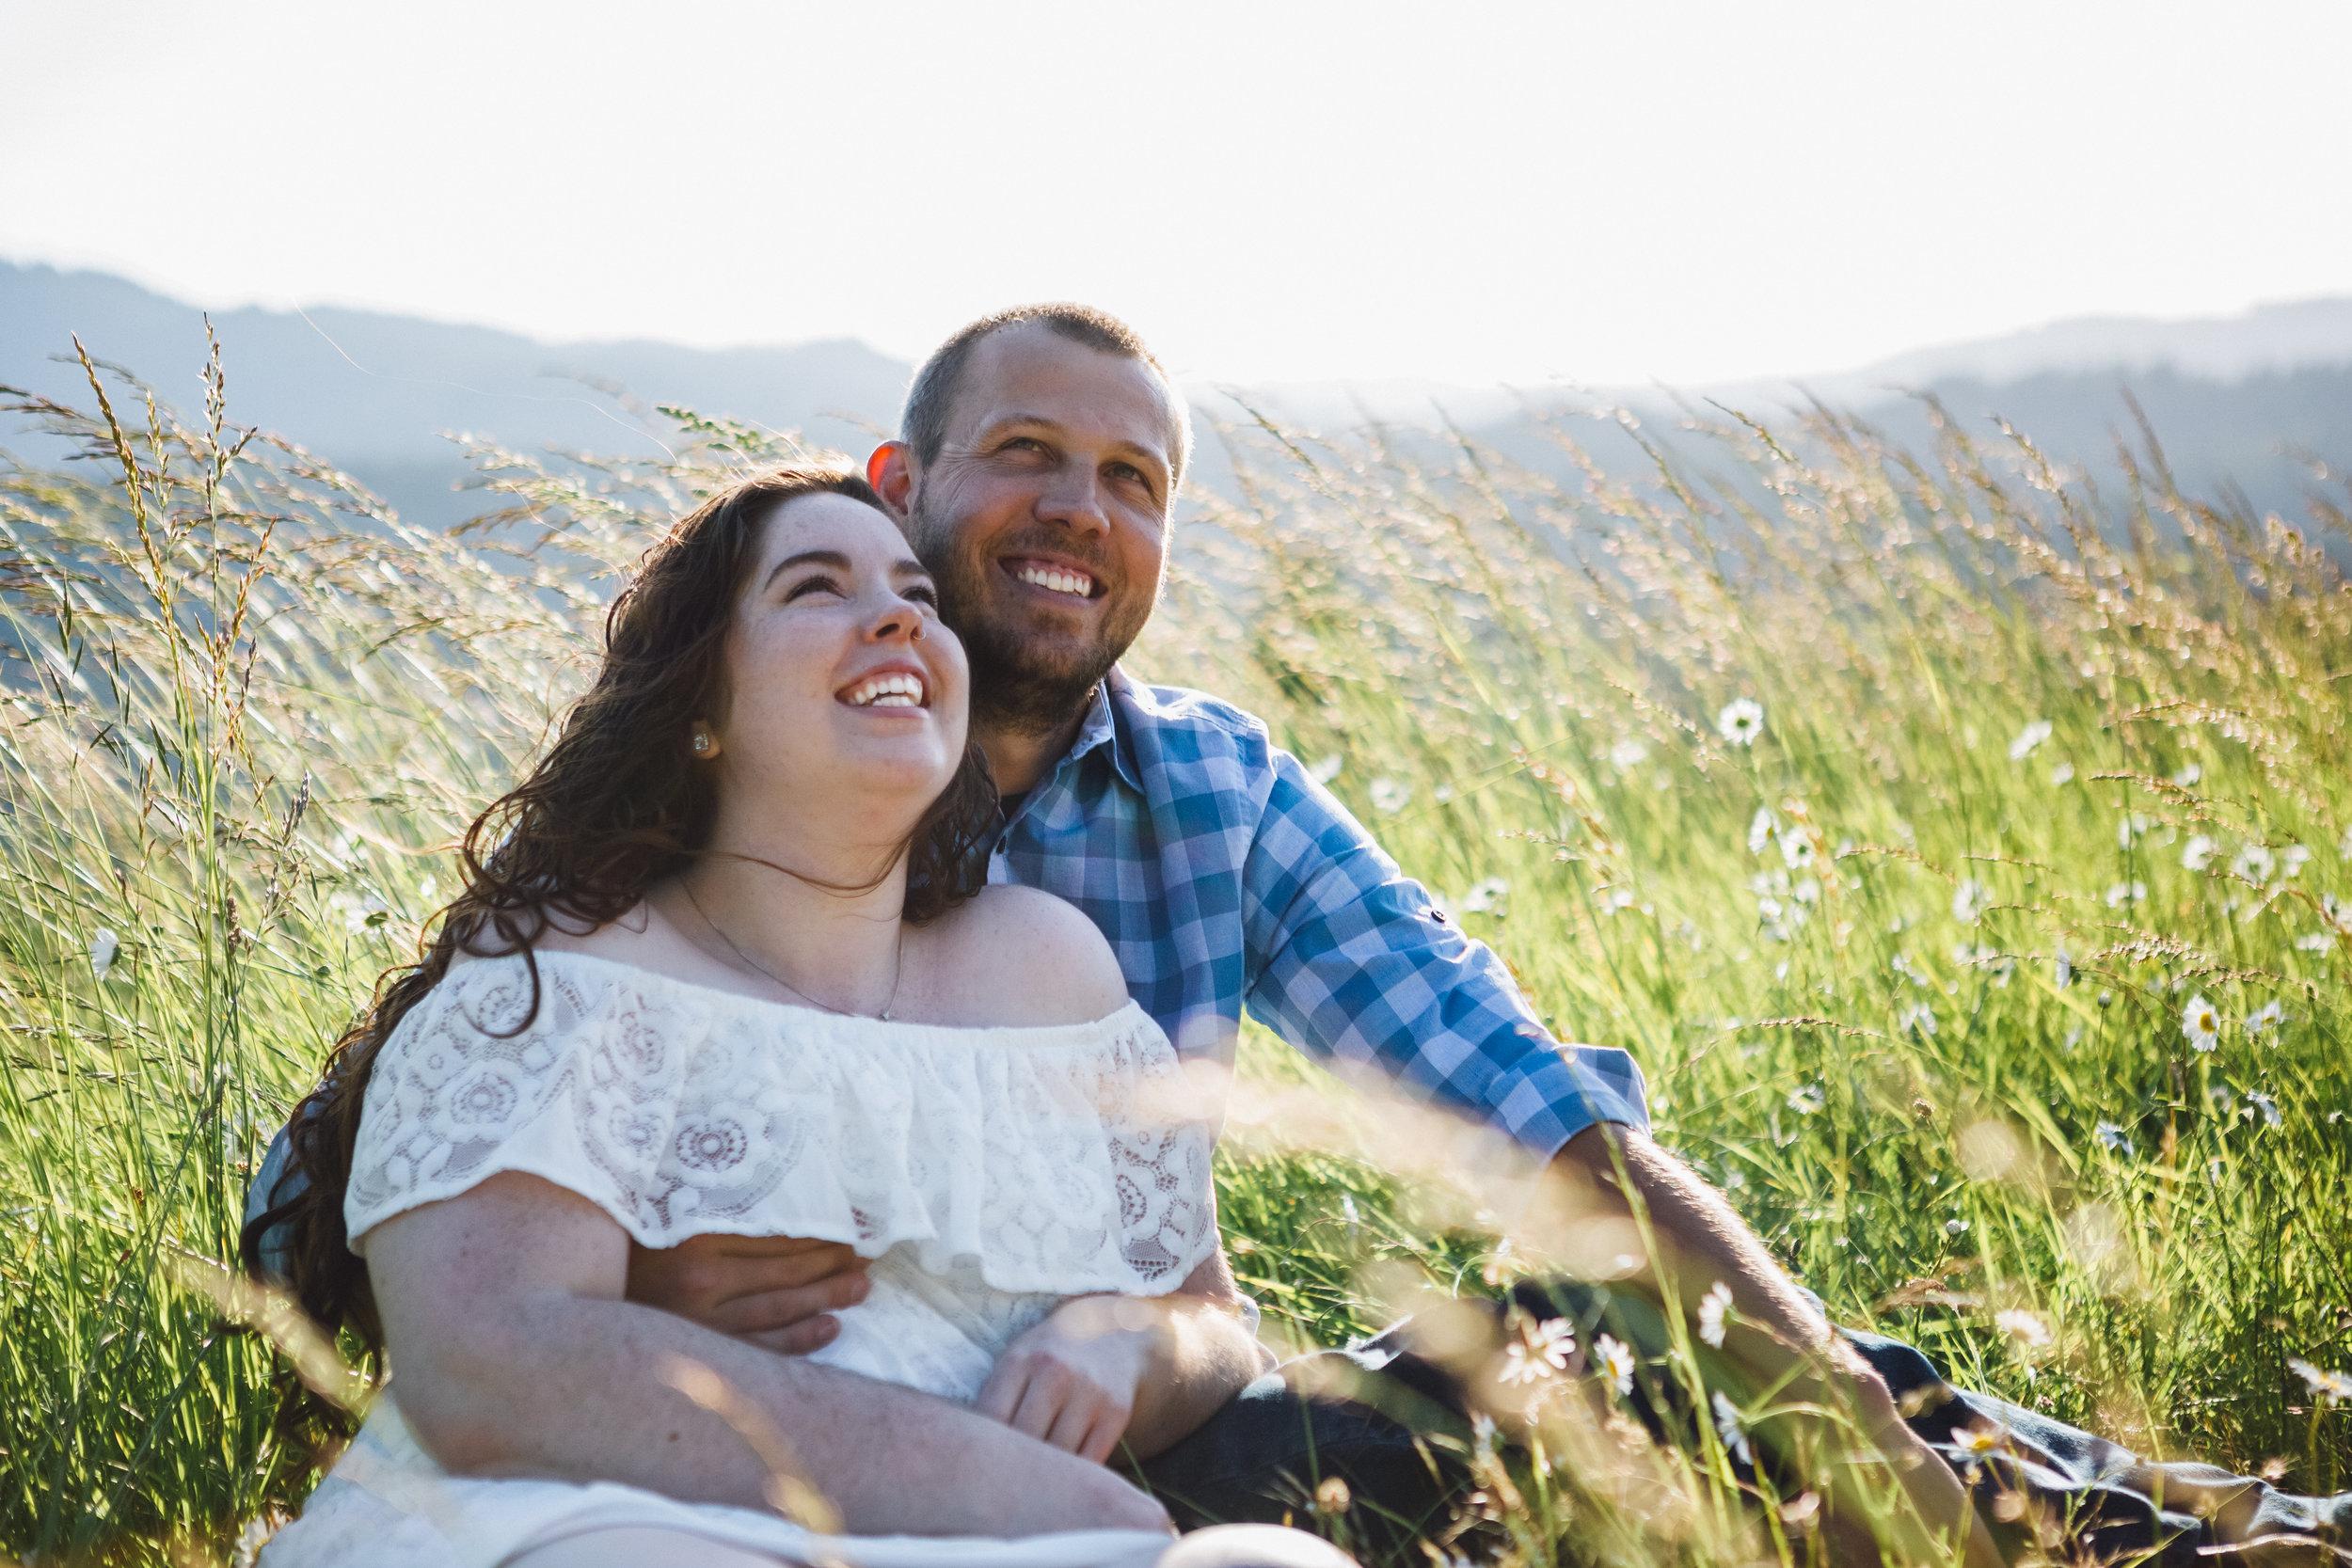 corvallis-oregon-photographer-fitton-green-engagement-photos8.jpg